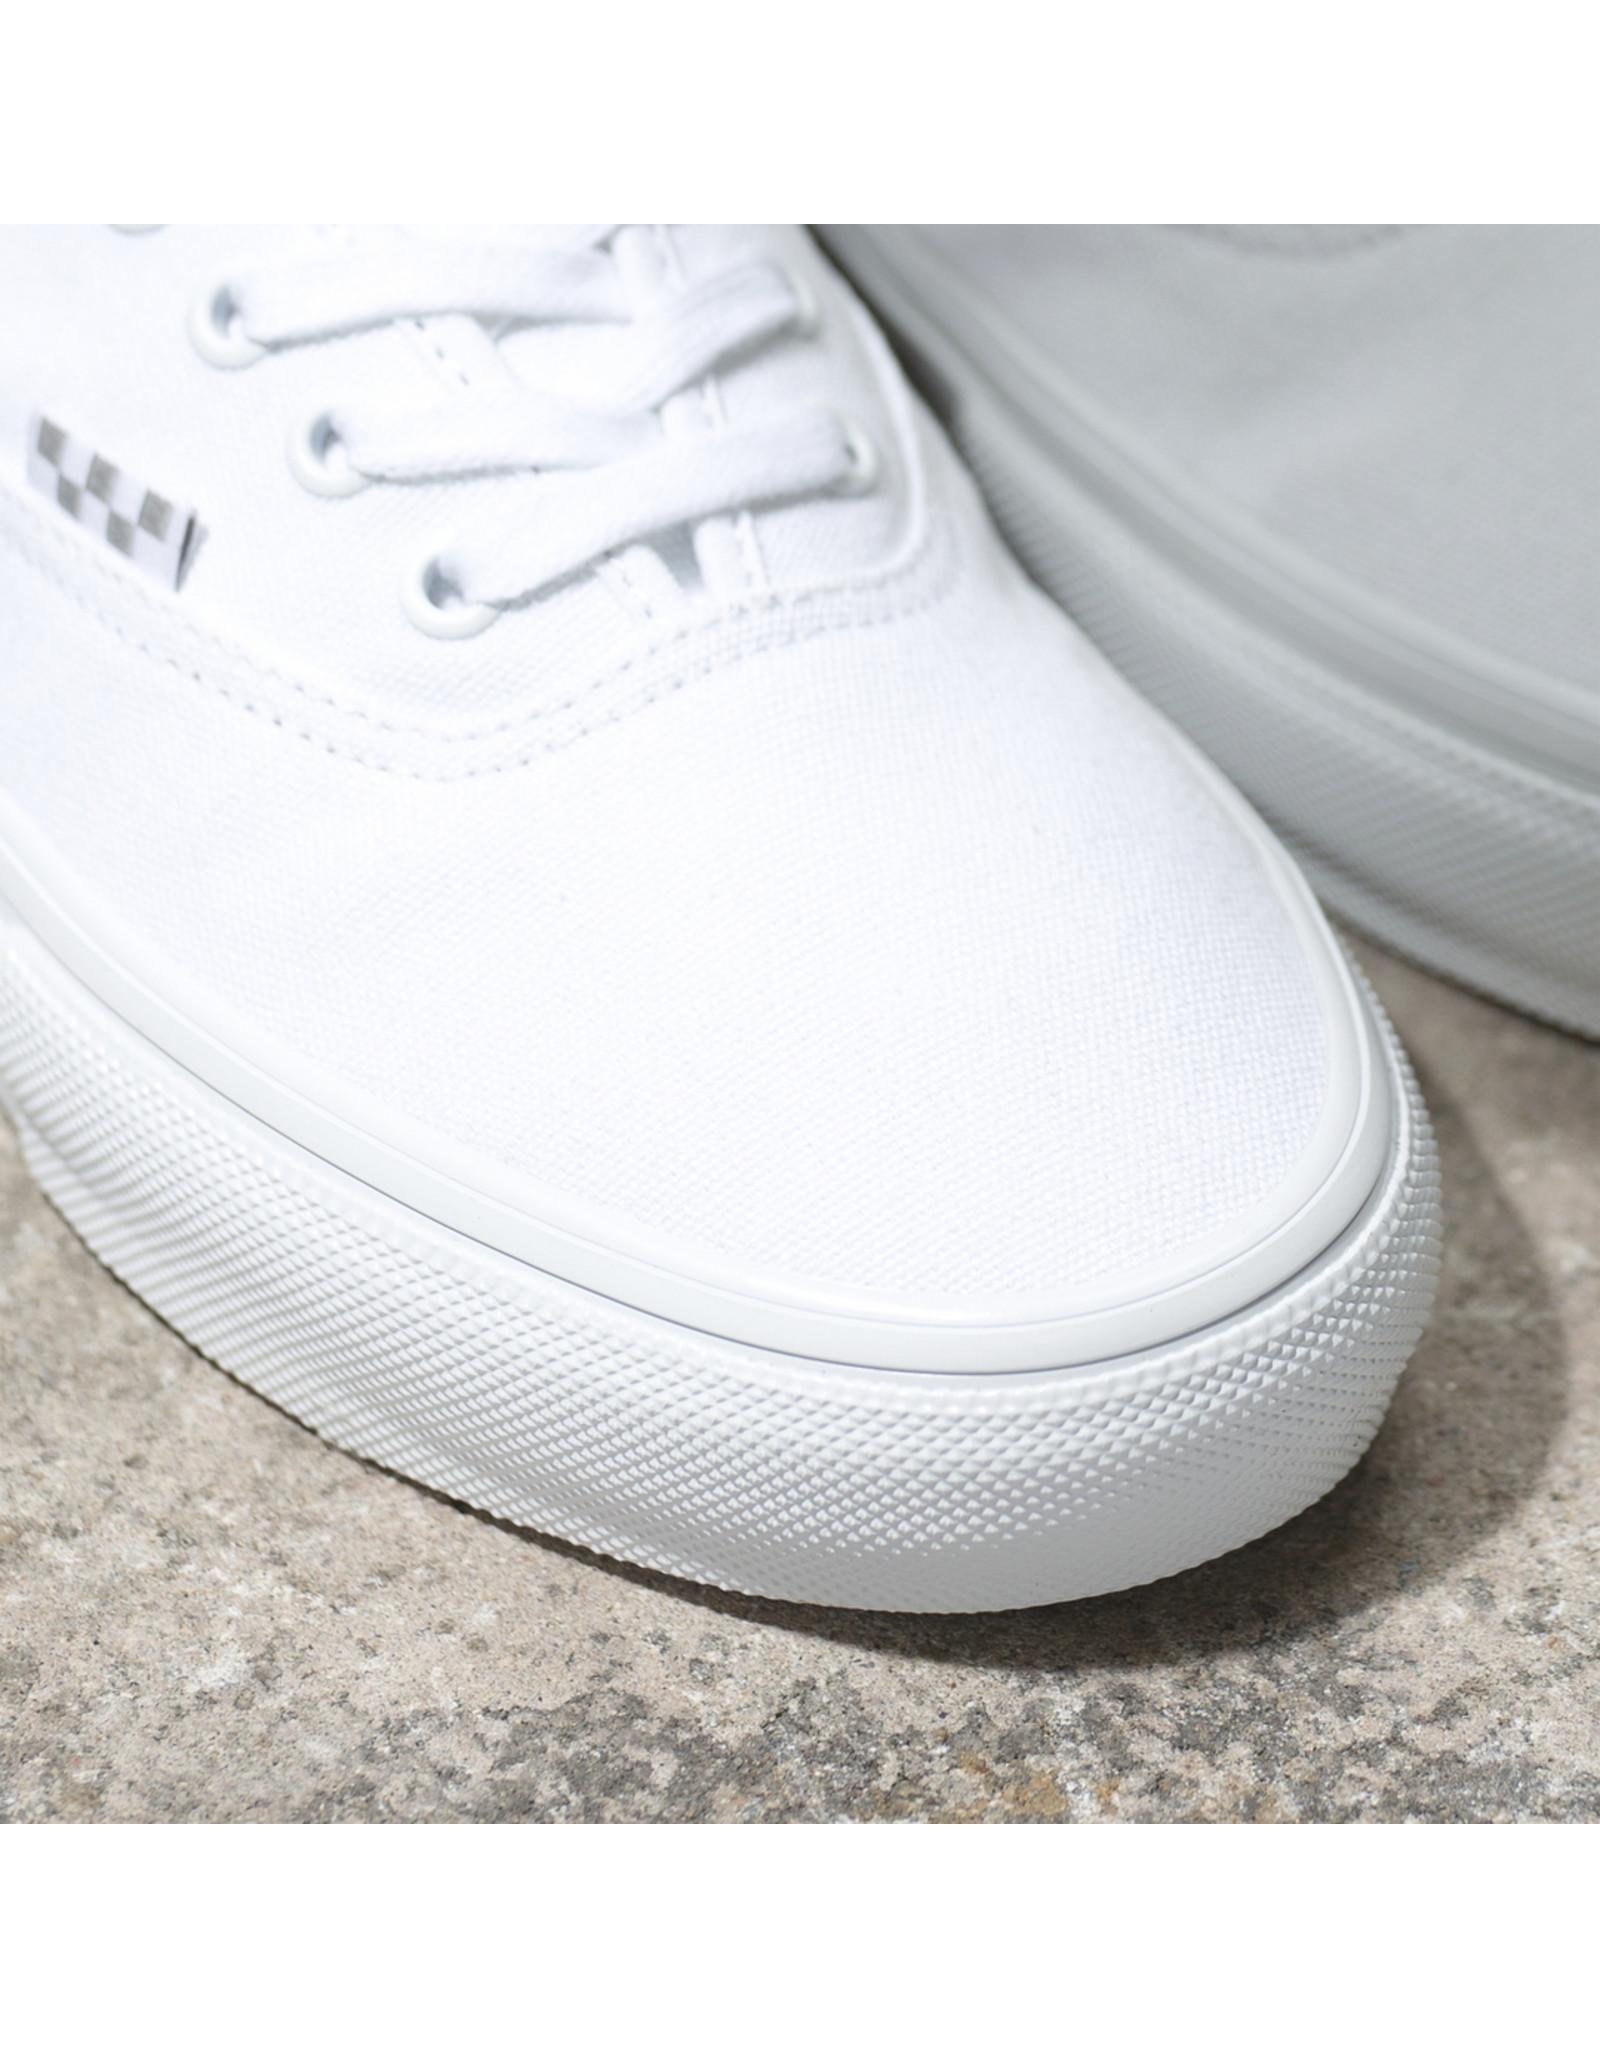 VANS VANS - AUTHENTIC SKATE - WHITE